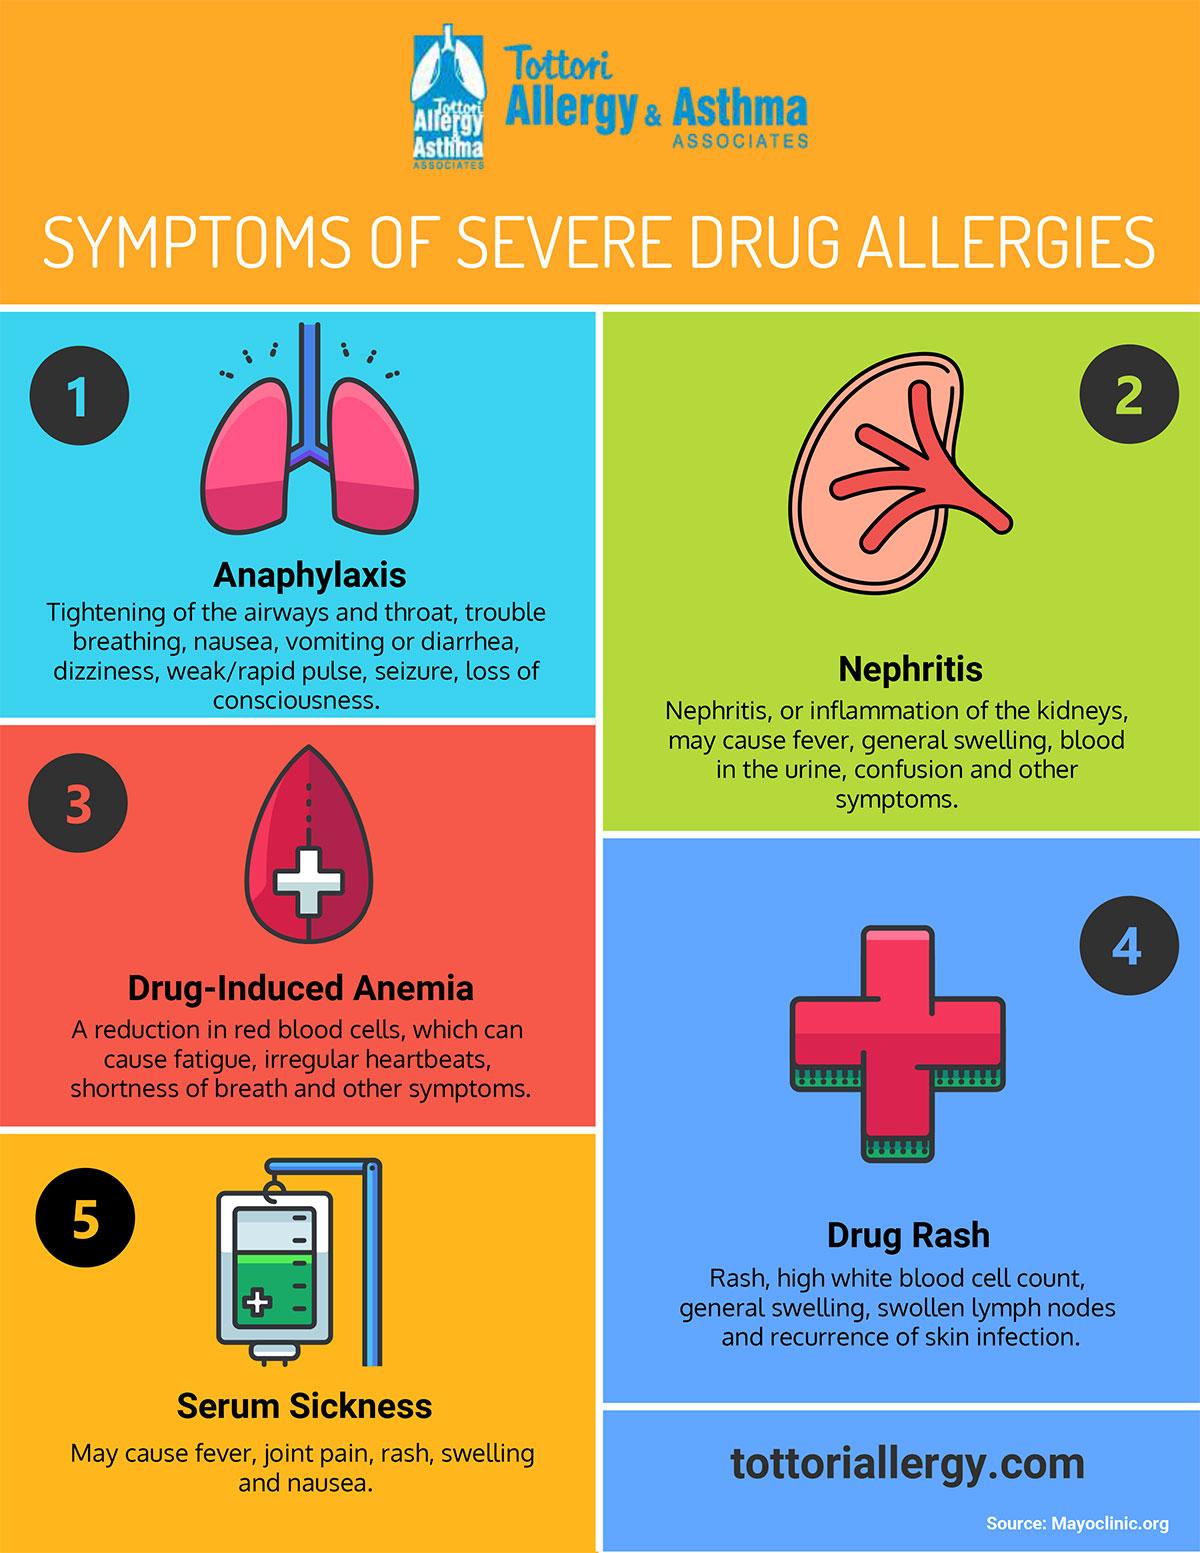 Symptoms of Severe Drug Allergies | Tottori Allergy & Asthma